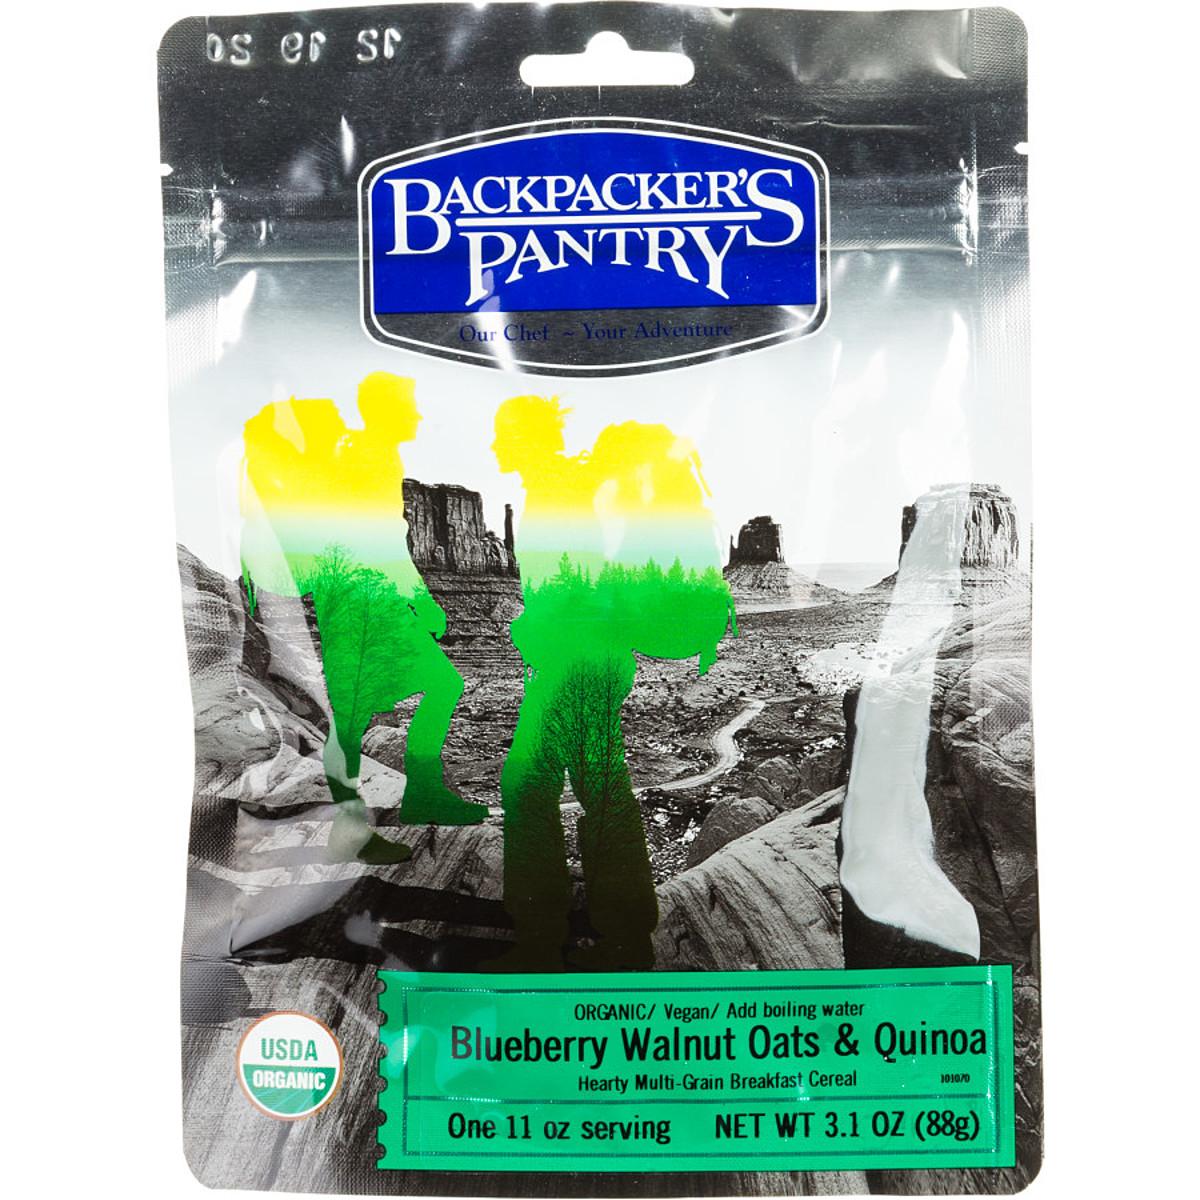 Backpacker's Pantry Organic Blueberry Walnut Oats & Quinoa